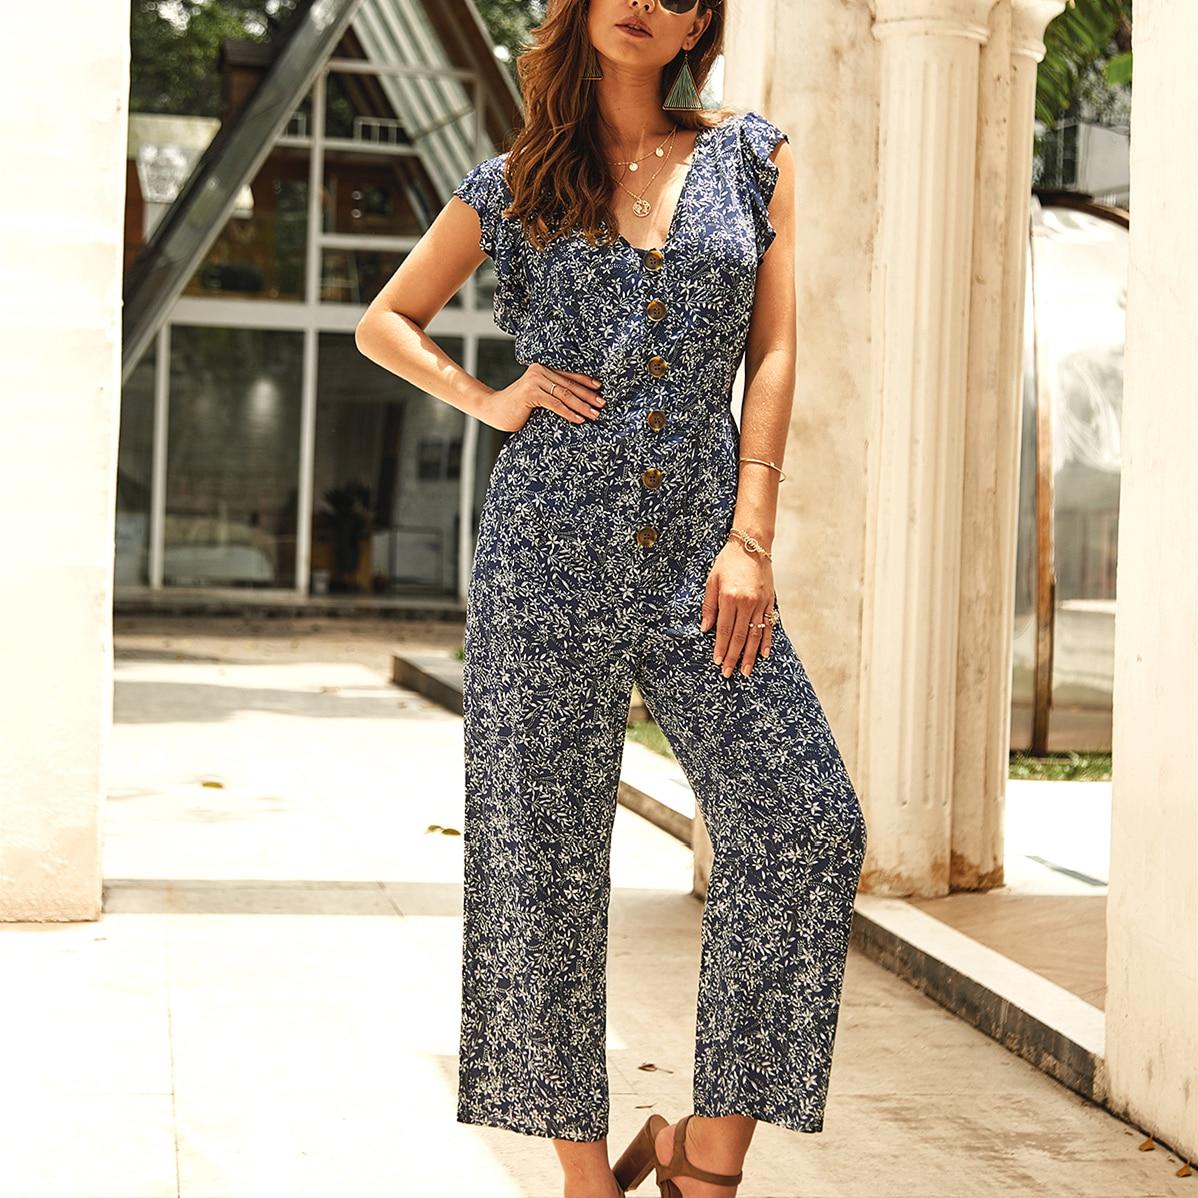 Women's Summer Boho Floral Jumpsuit Fashion Ladies Sleeveless V-Neck Playsuit Party Wide Leg Long Trousers Romper